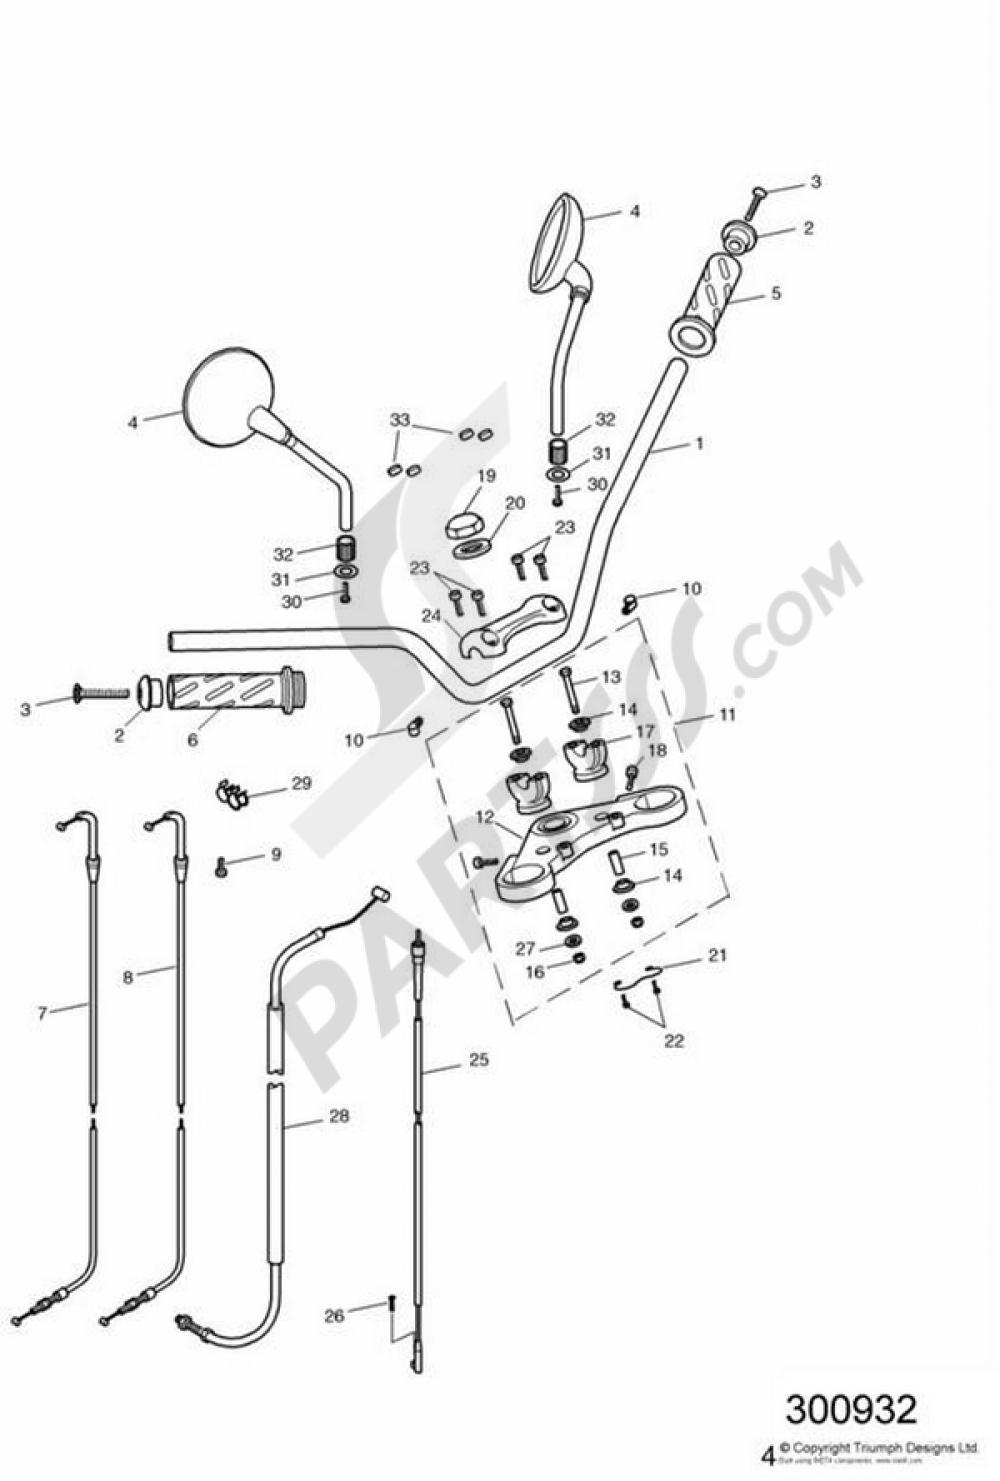 Handlebars, Top Yoke, Cables & Mirrors Triumph BONNEVILLE T100 ... on victory vegas wiring diagram, triumph t100 spark plug, bmw r100 wiring diagram, triumph t100 tools, benelli 900 sei wiring diagram, toyota t100 wiring diagram, harley sportster wiring diagram, triumph t100 motor, triumph t100 seats,